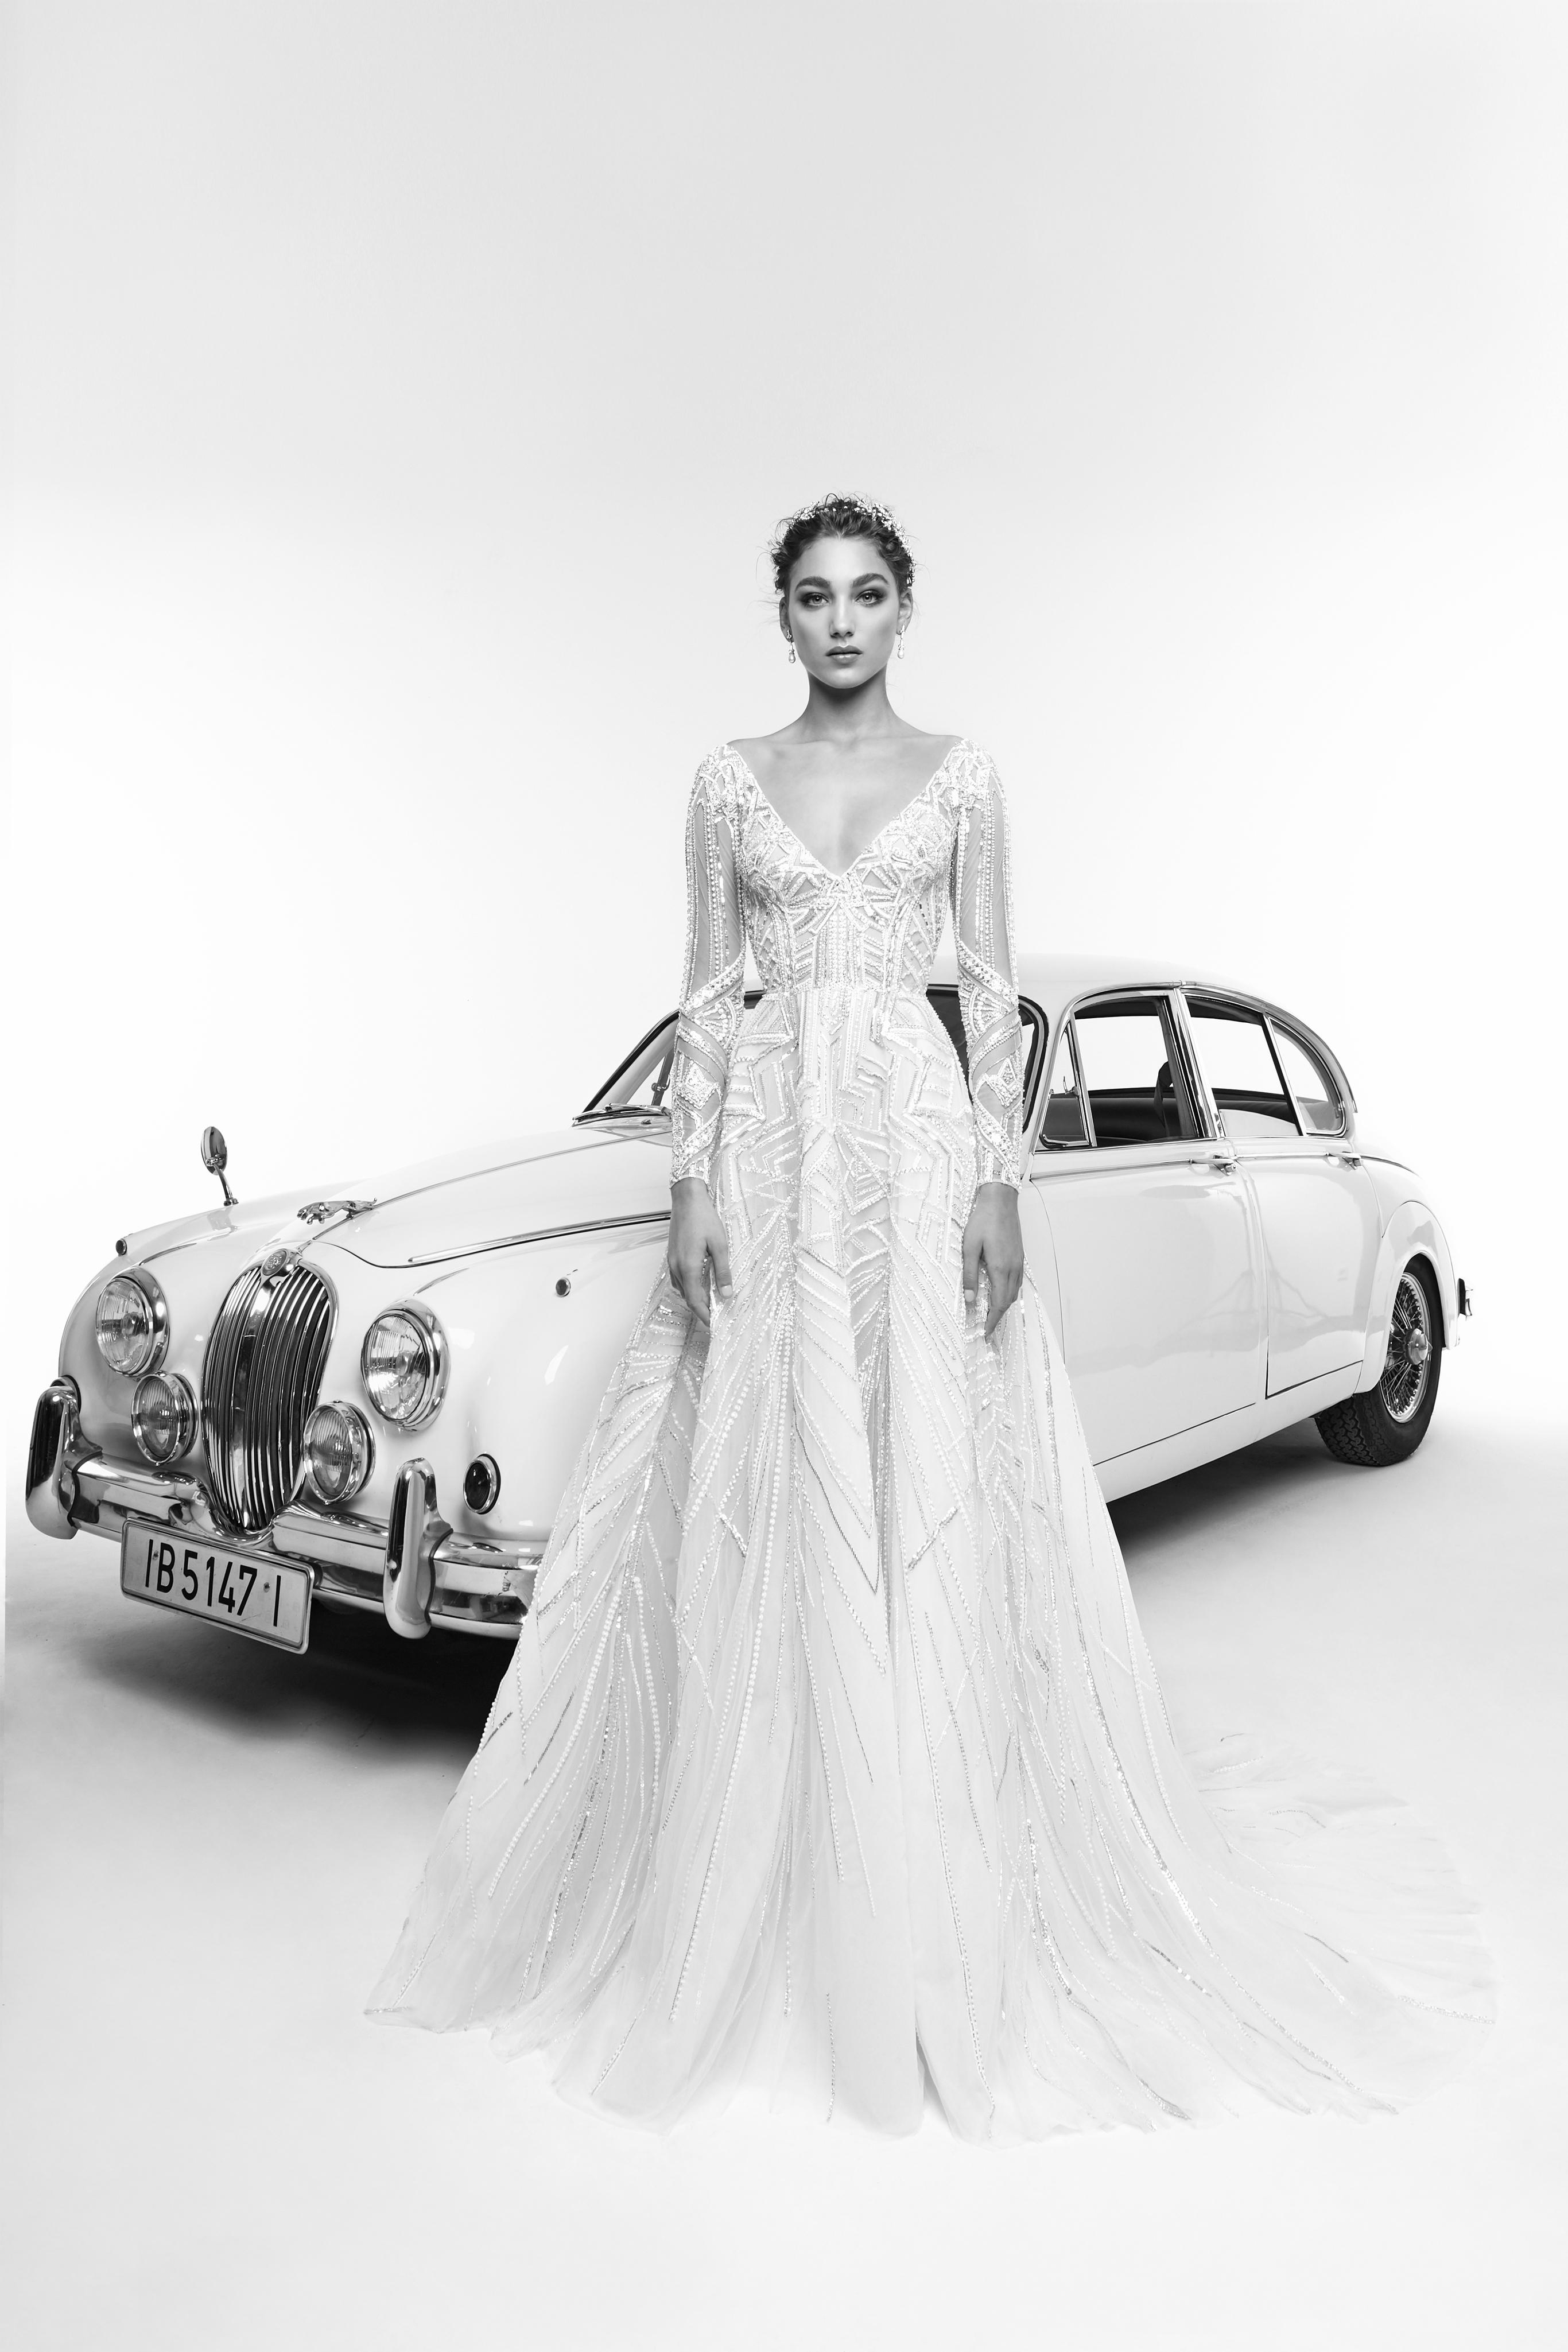 zuhair murad wedding dress spring 2019 v-neck a-line with long sleeves